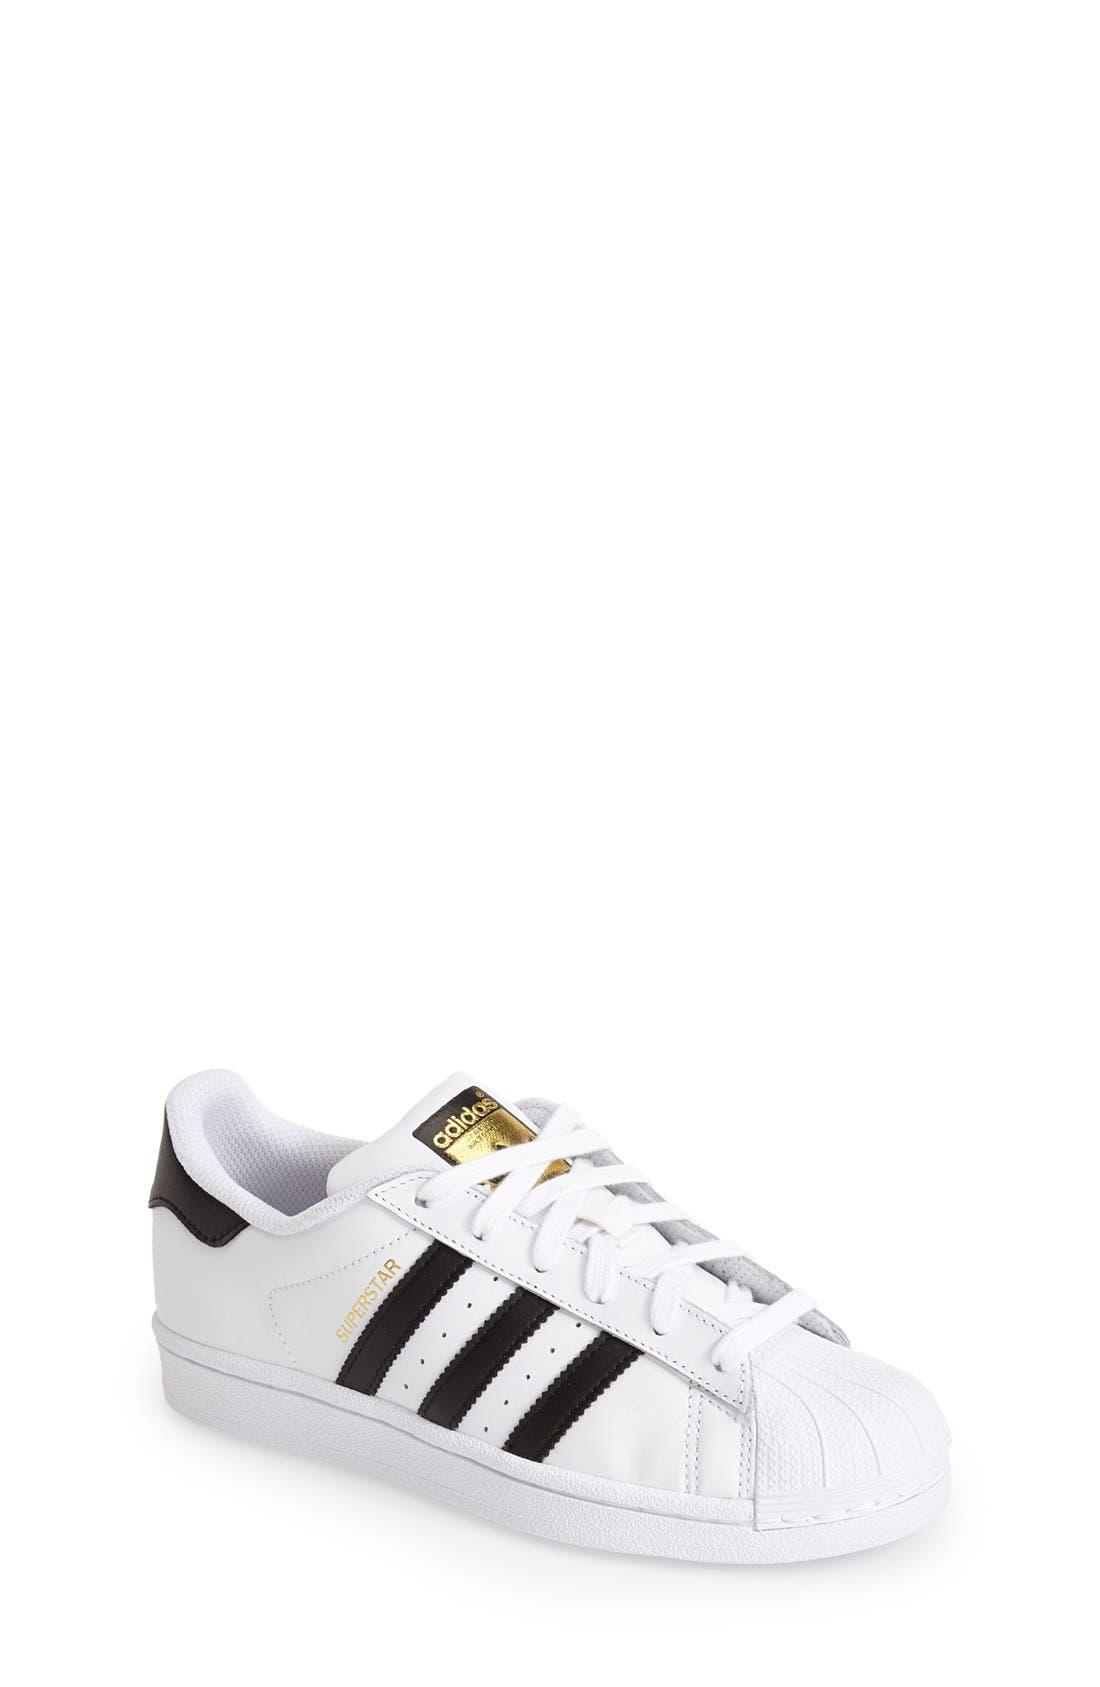 adidas \u0027Superstar II\u0027 Sneaker (Big Kid)